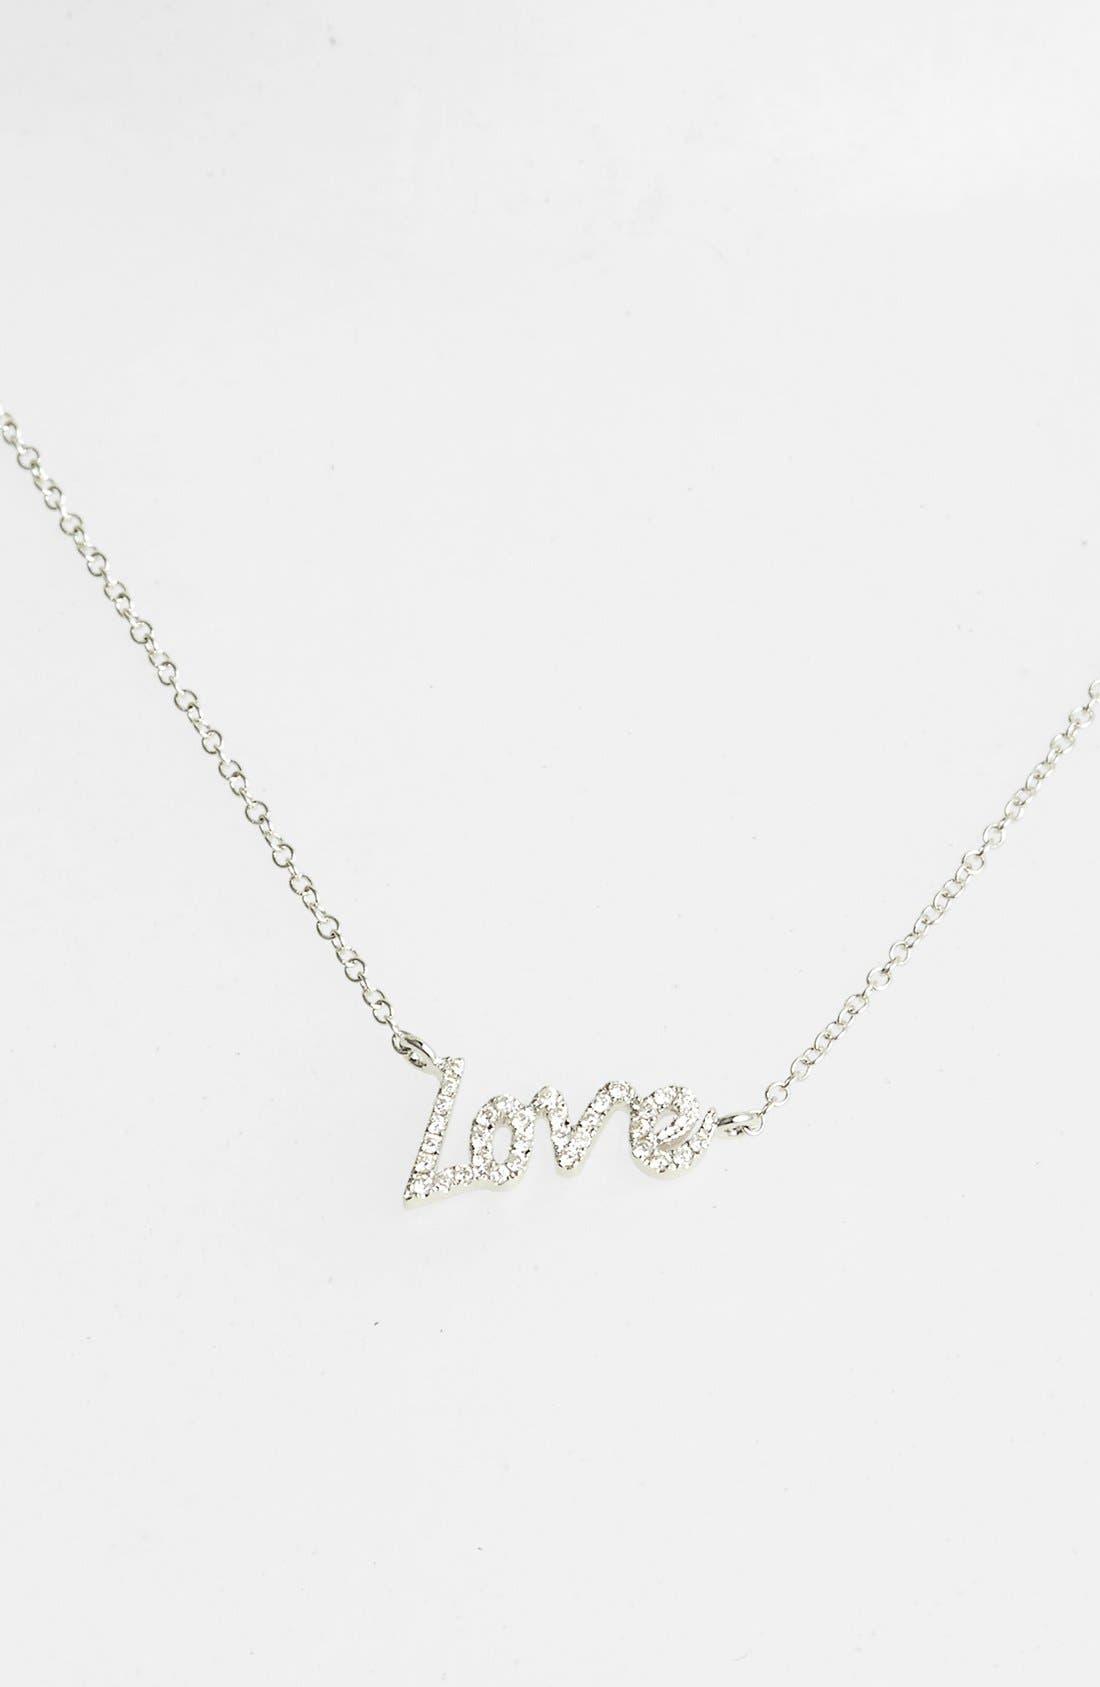 MeiraT Dazzling Diamond Love Pendant Necklace